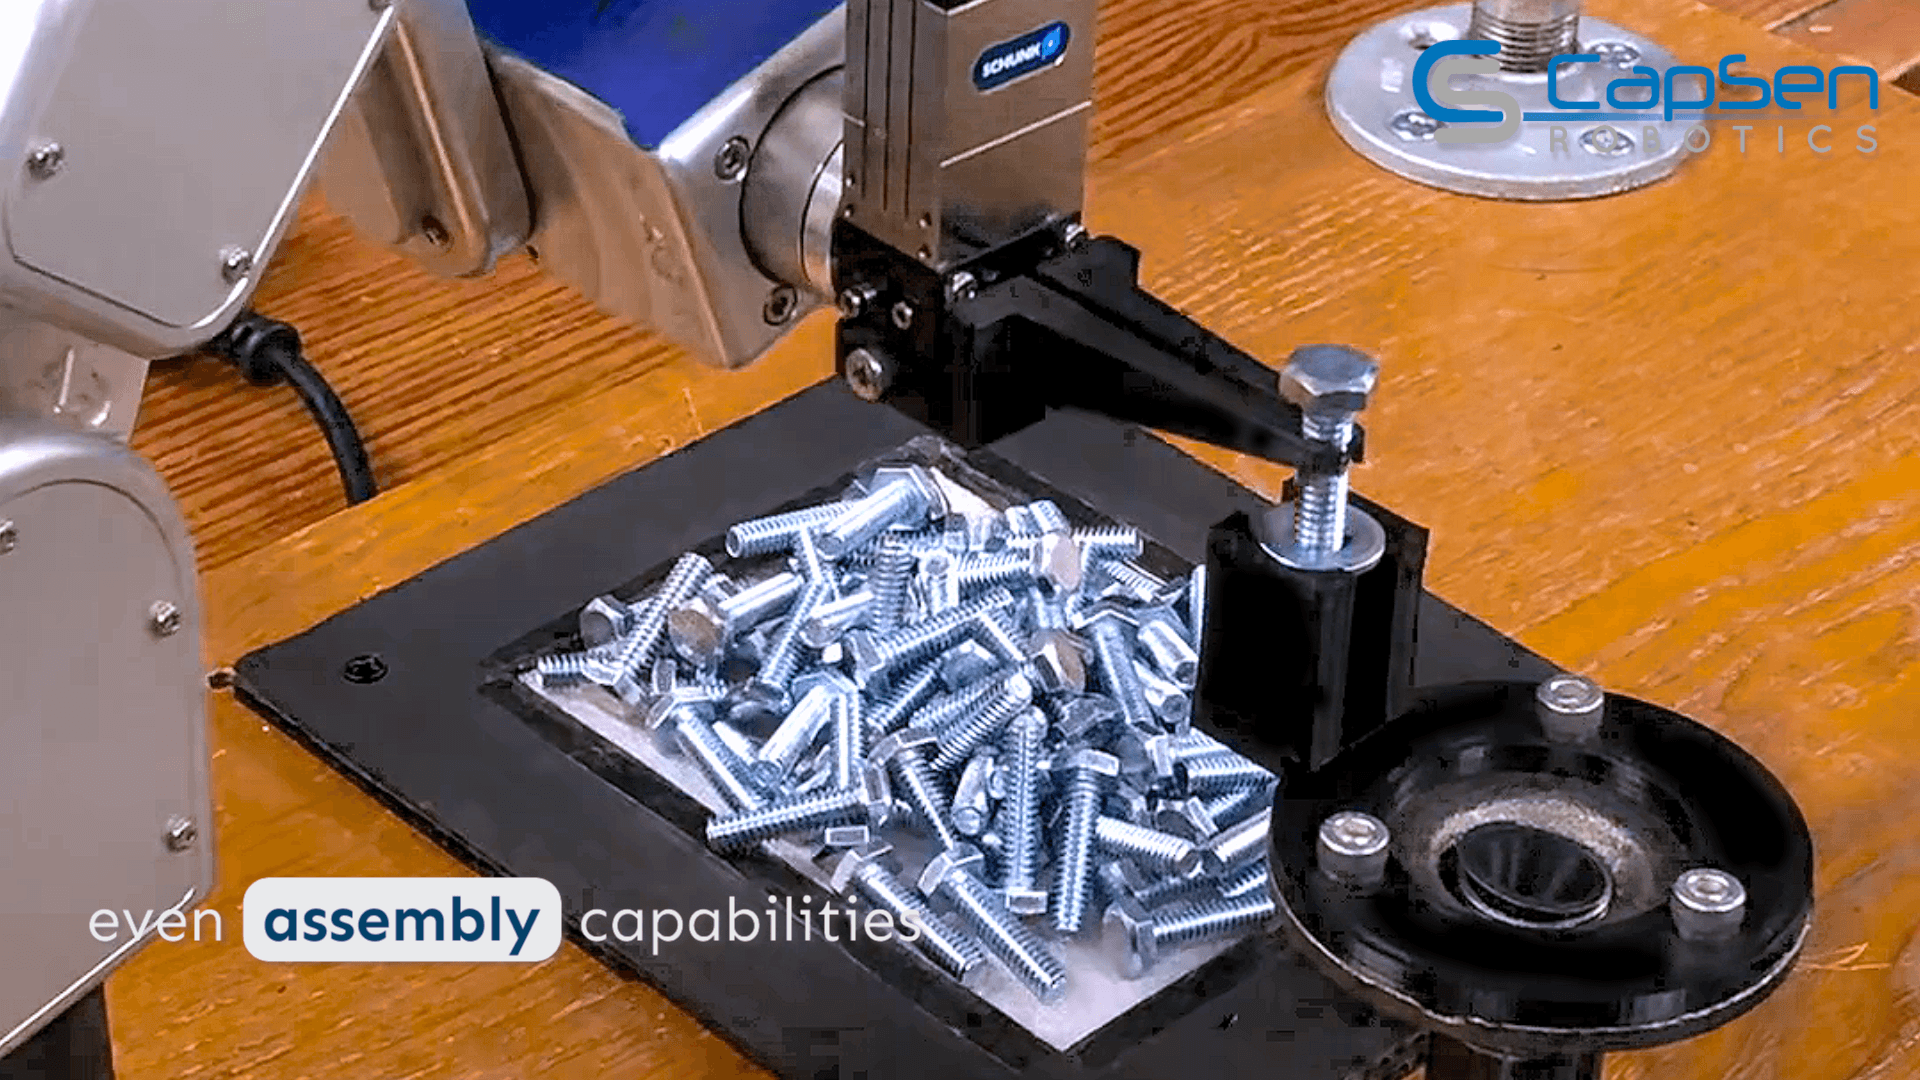 CapSen Robotics with Meca500 industrial arm